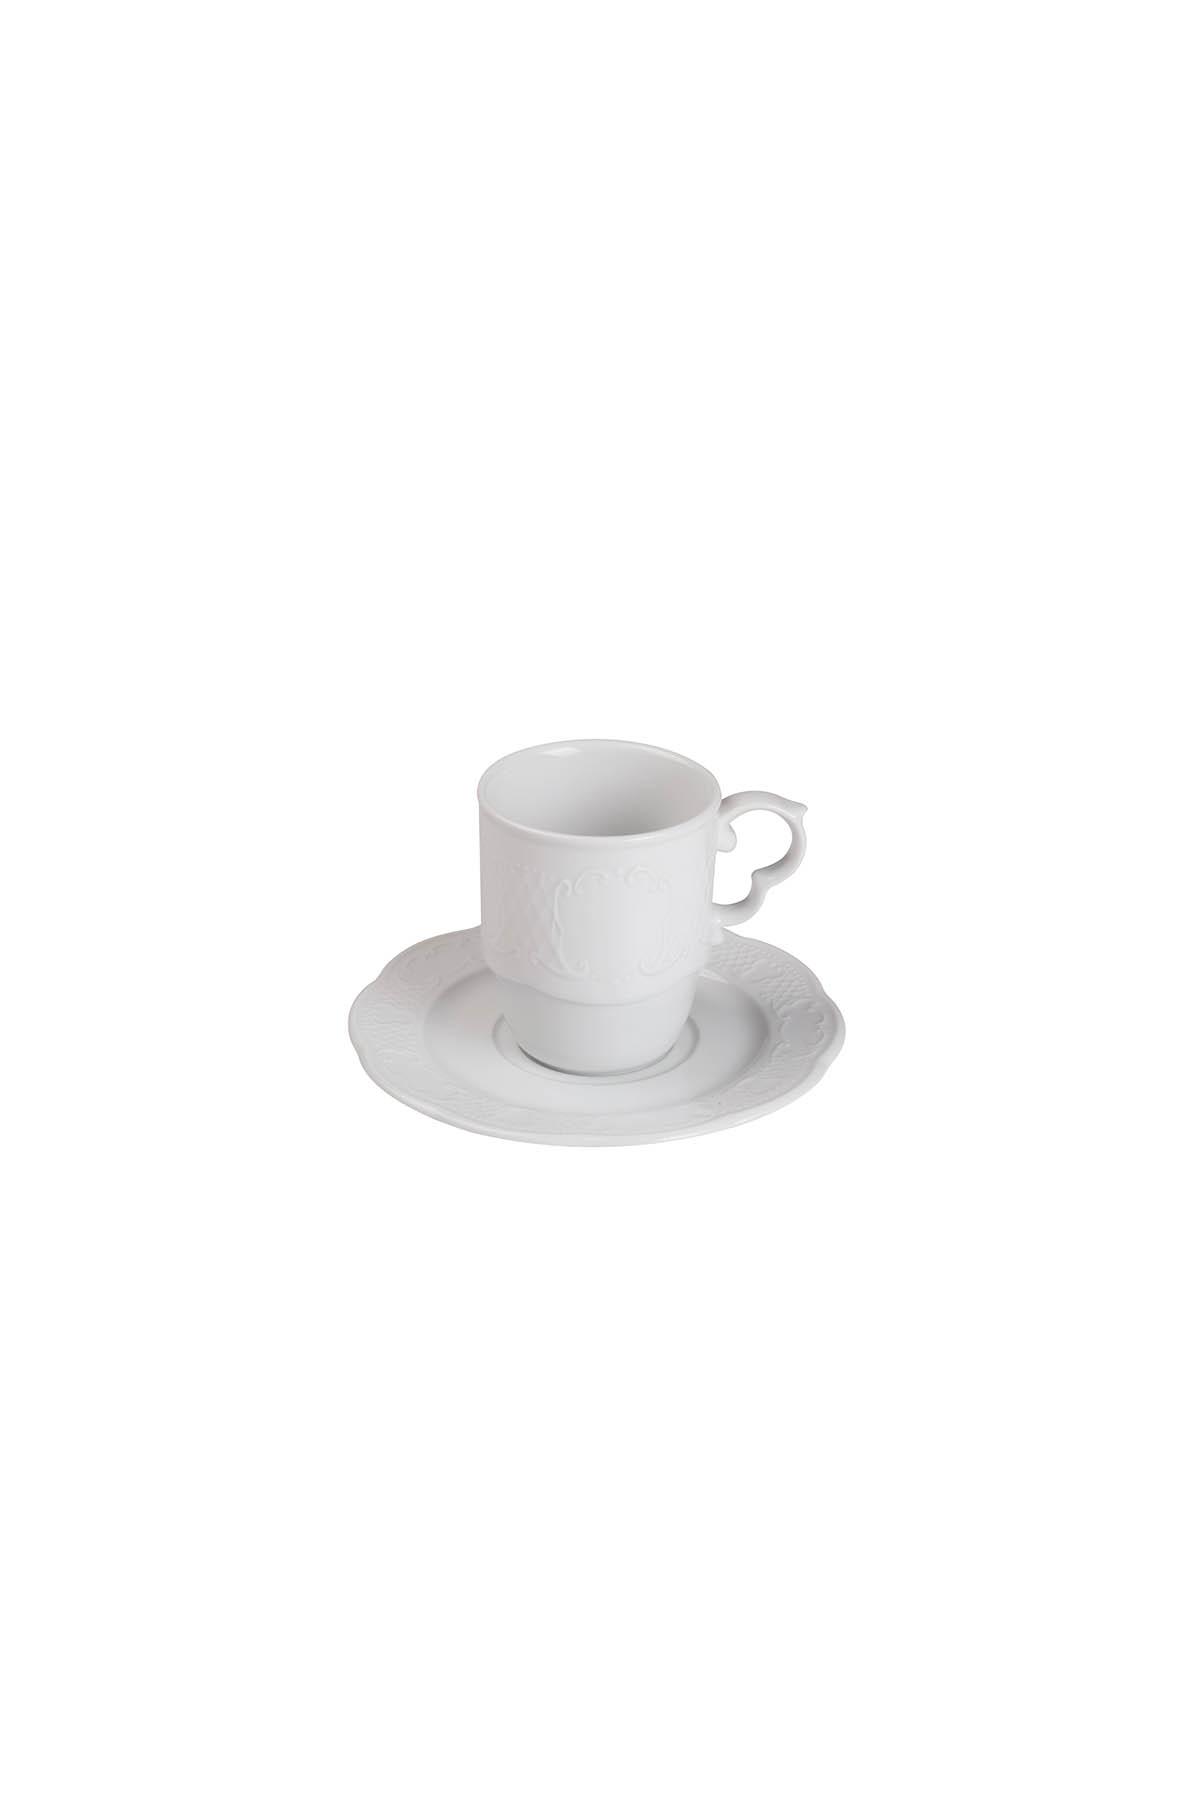 Kütahya Porselen - Kütahya Porselen Menuet Latte Seti 1